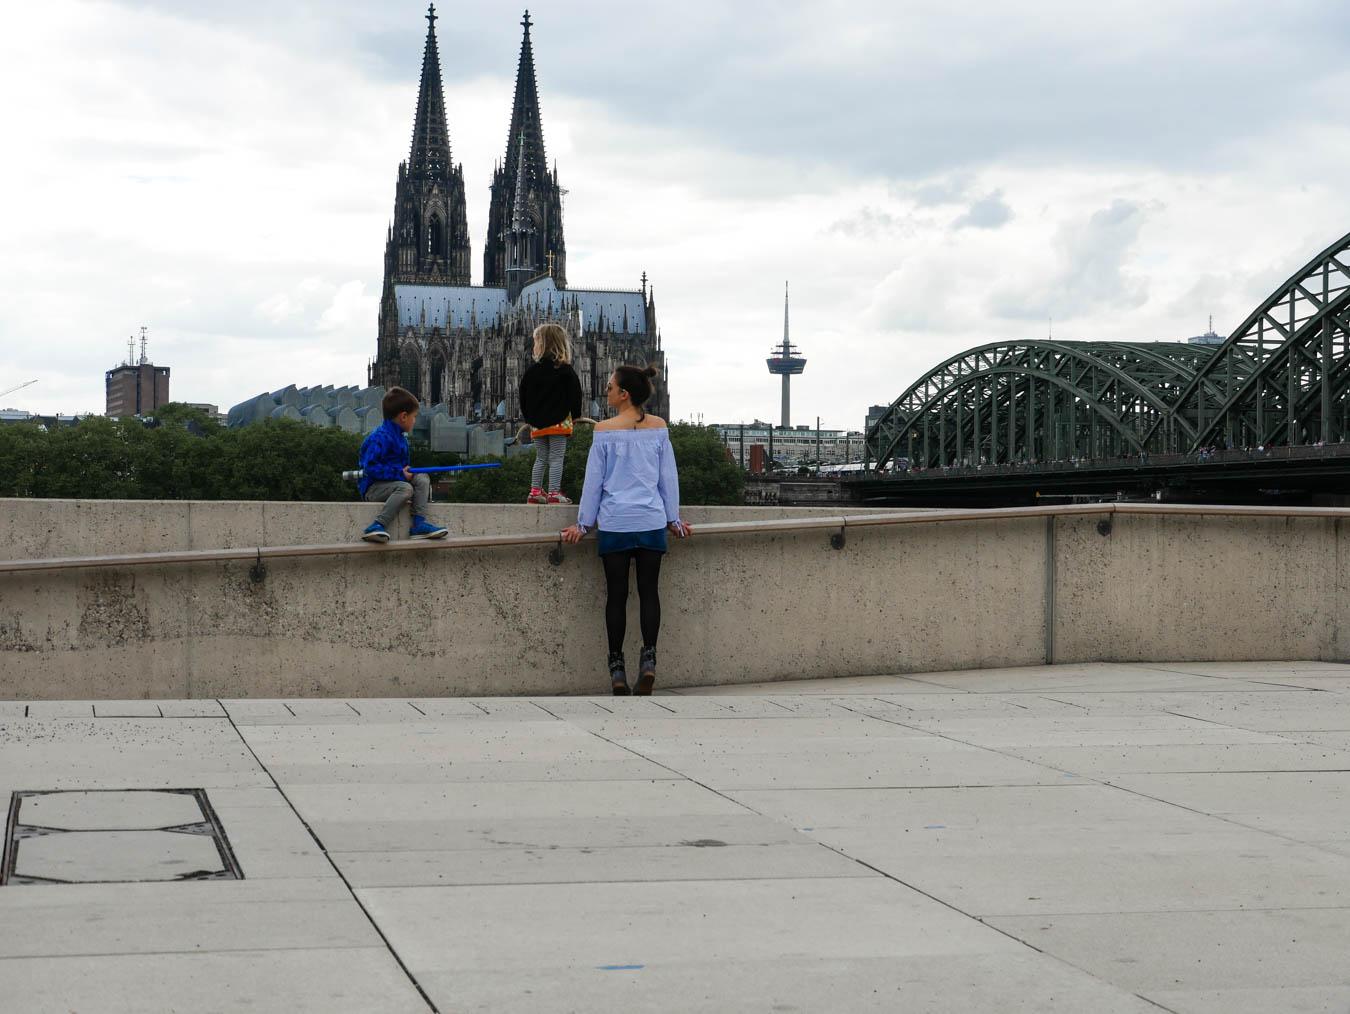 Hohenzollern Brücke Köln